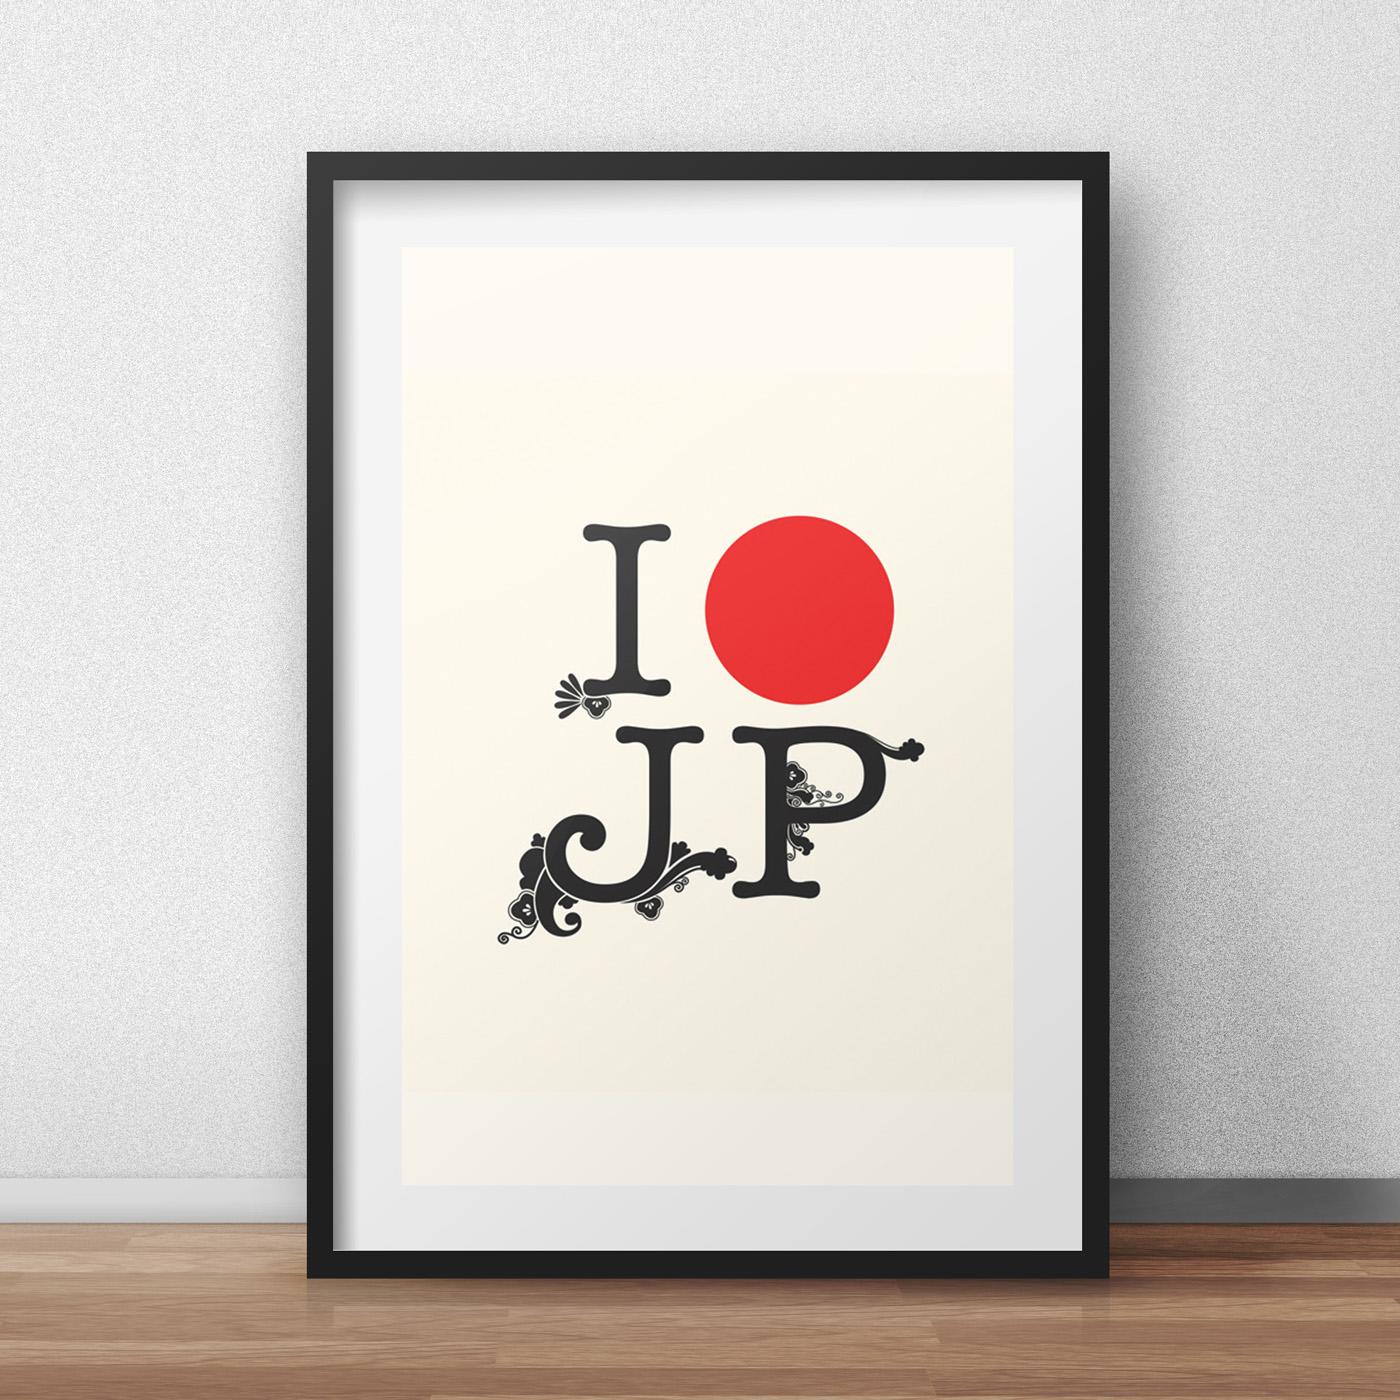 JP 03